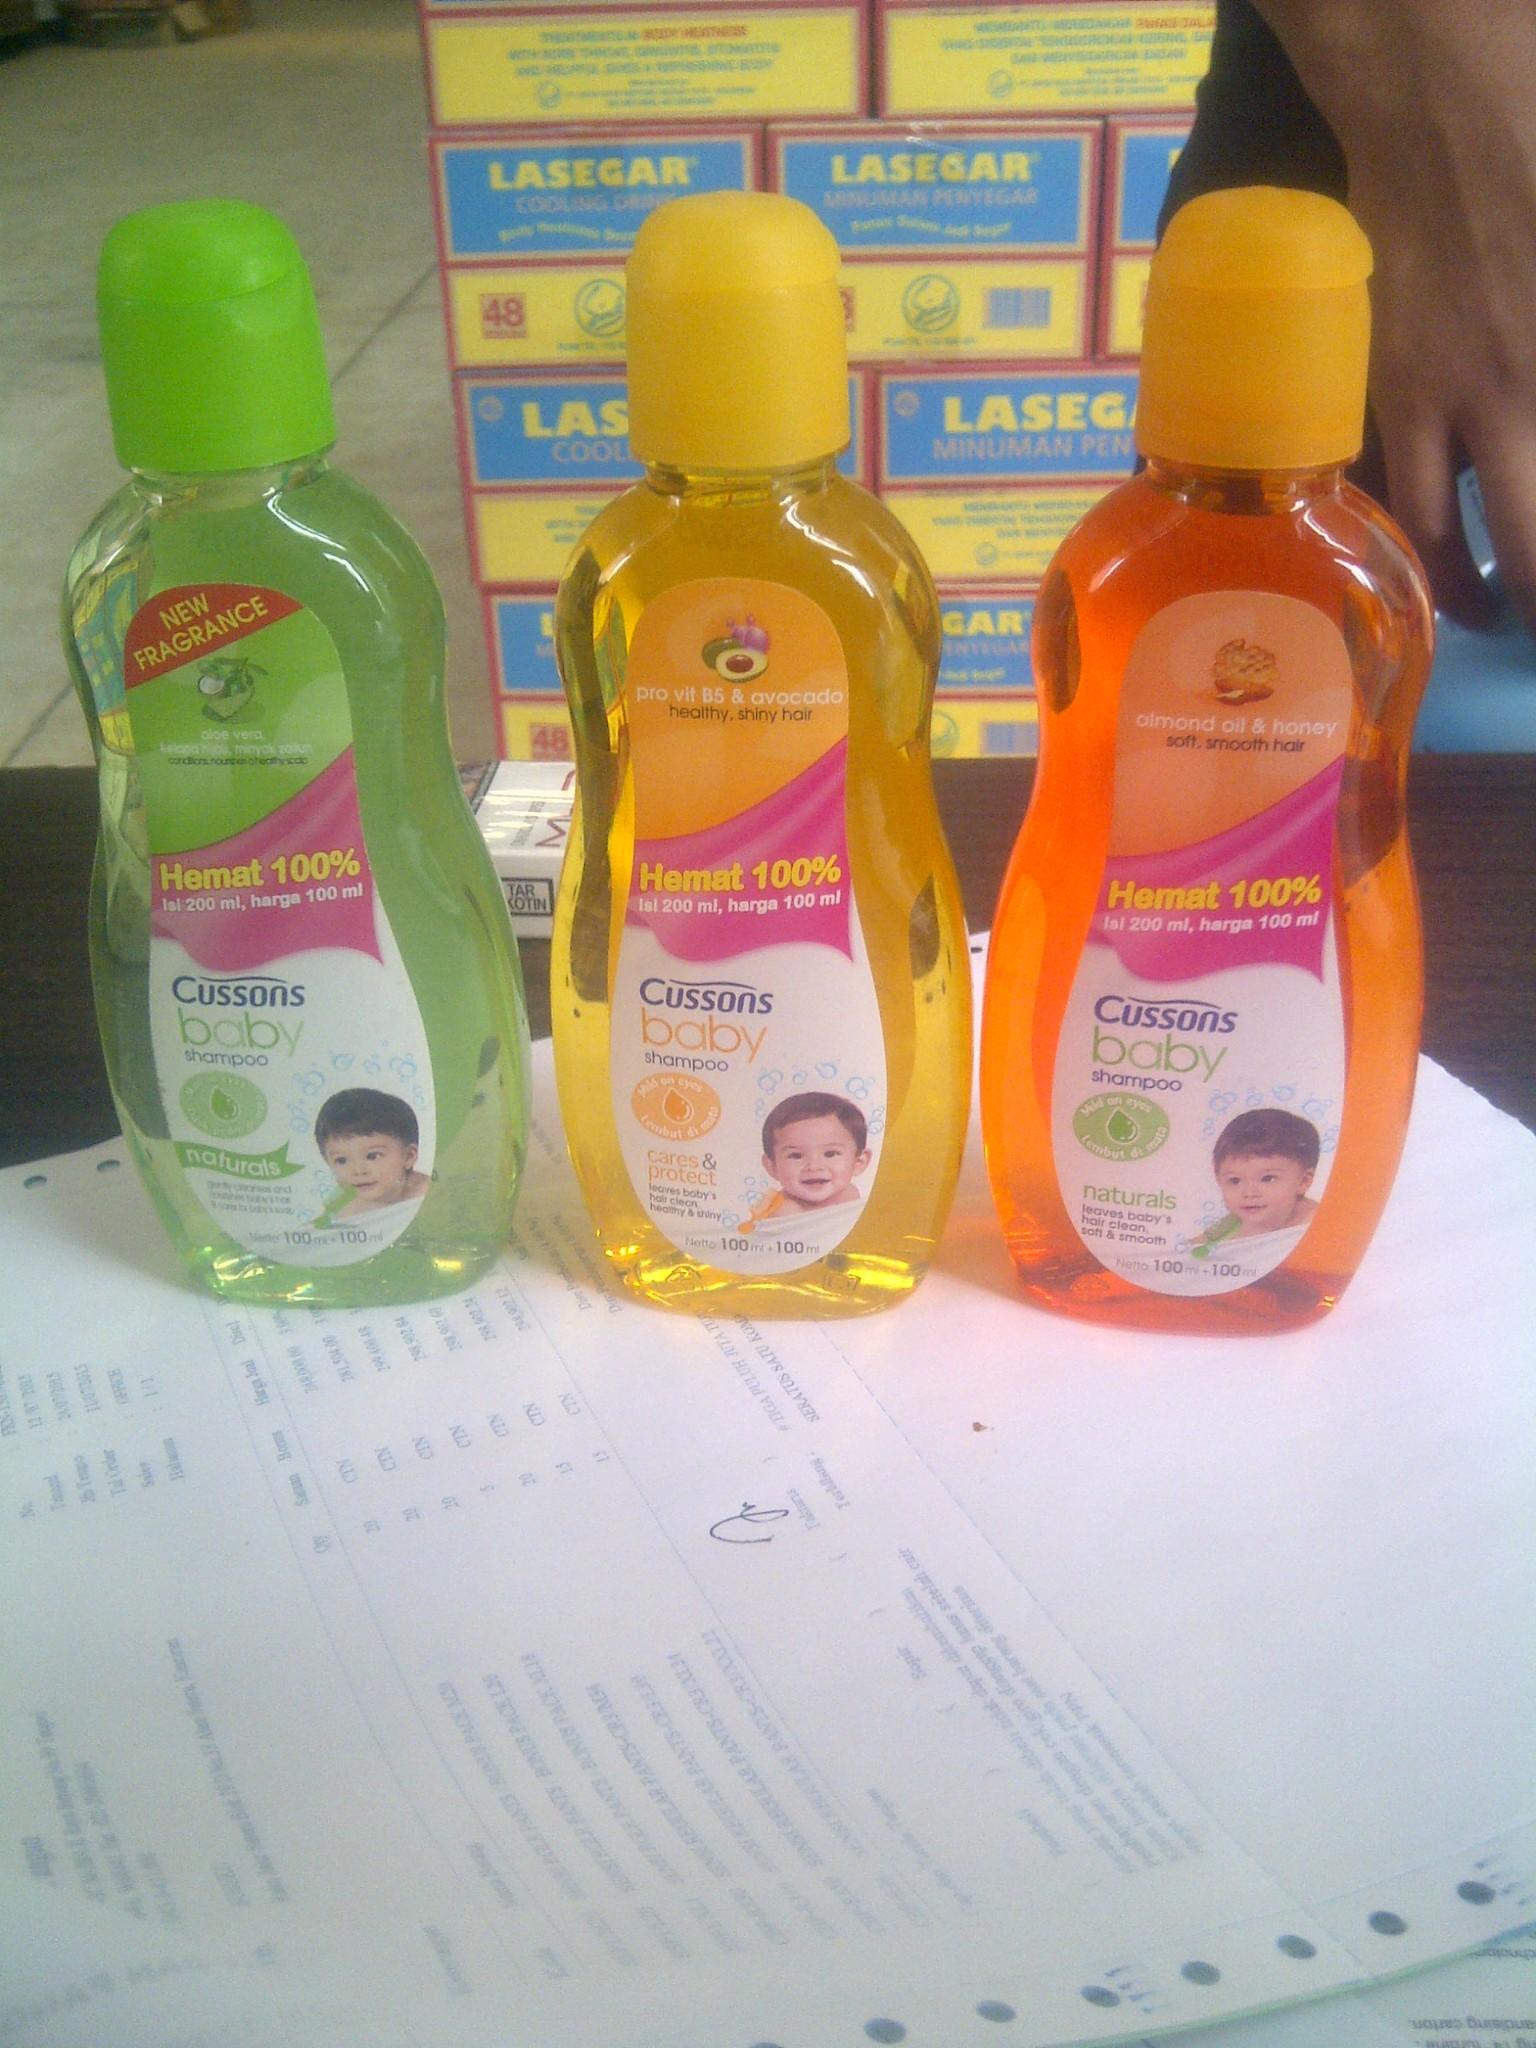 Jual Cussons Baby Shampoo 100 Ml Toko Tokopedia Oil Soft And Smooth 100ml